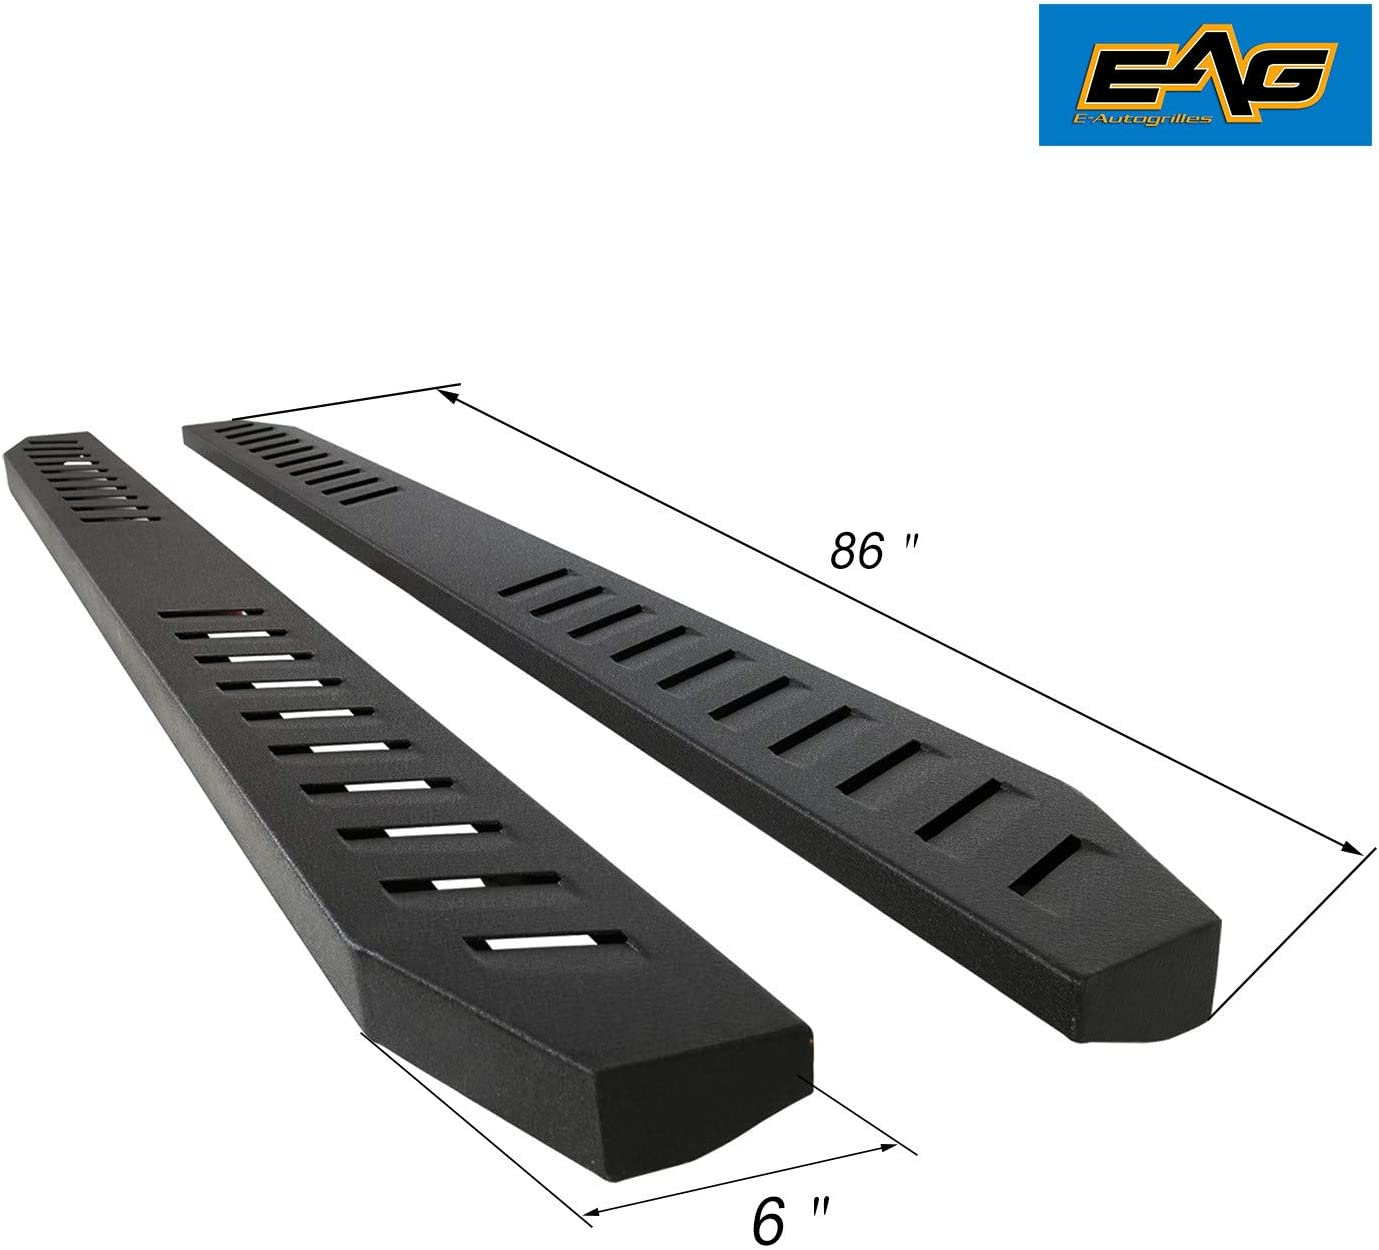 EAG 86 Raptor Running Board//Nerf Bars W//Brackets Fit for 99-16 Superduty F250//F350 Regular//Super//Crew Cab